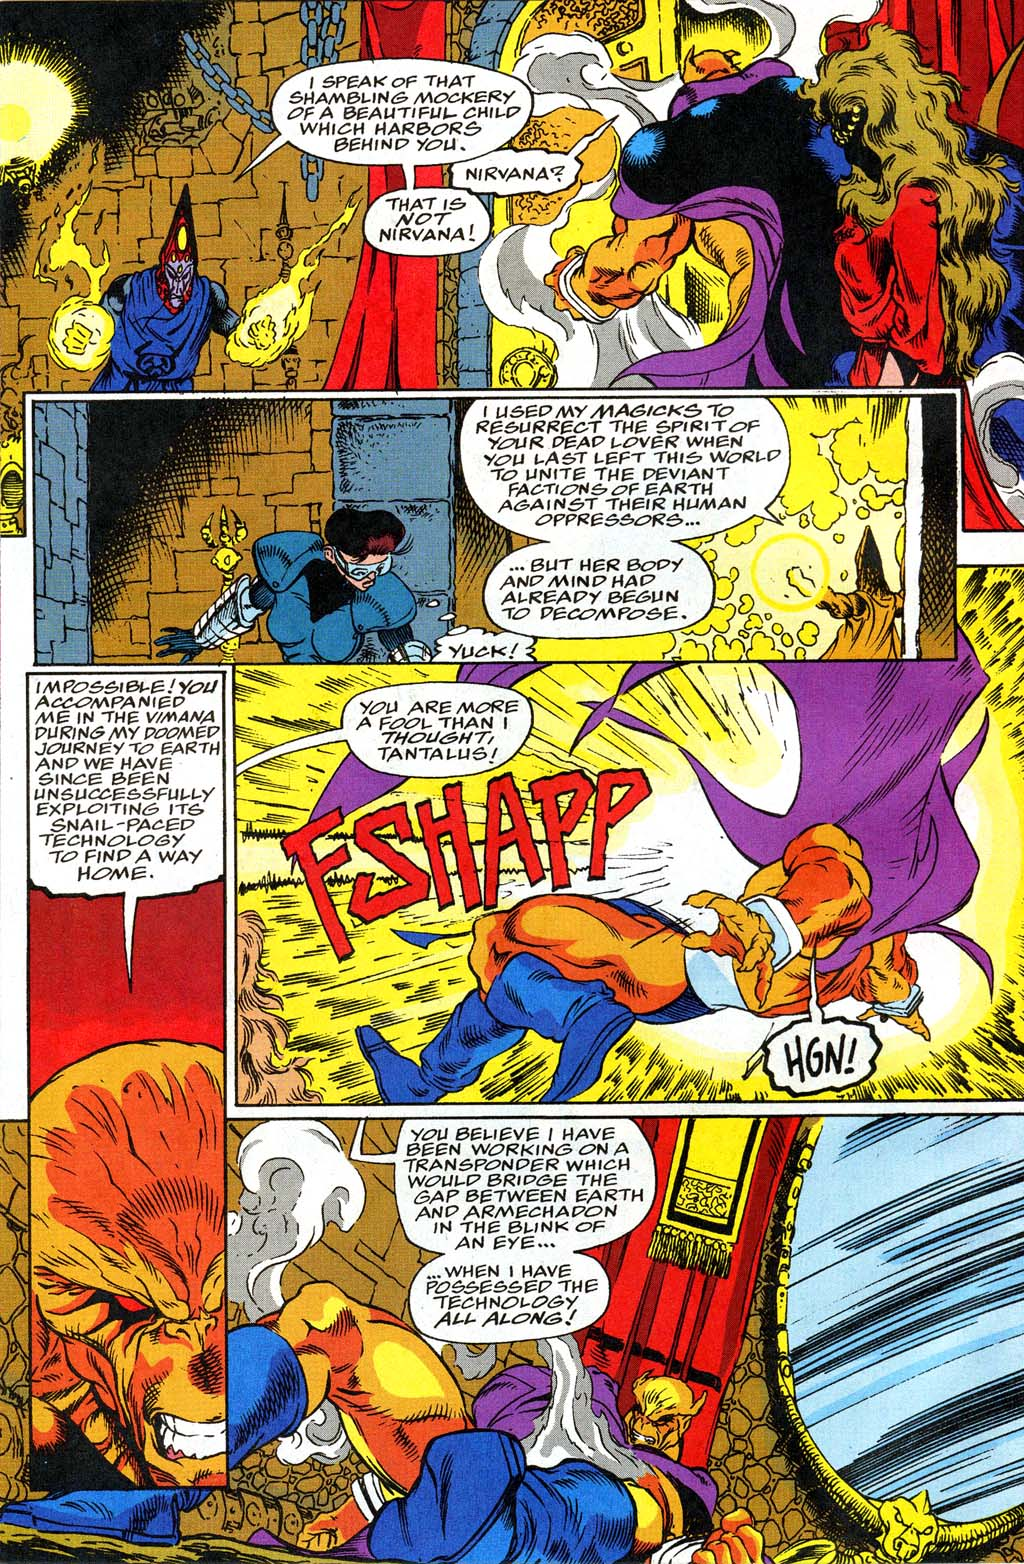 Read online Blackwulf comic -  Issue #9 - 4